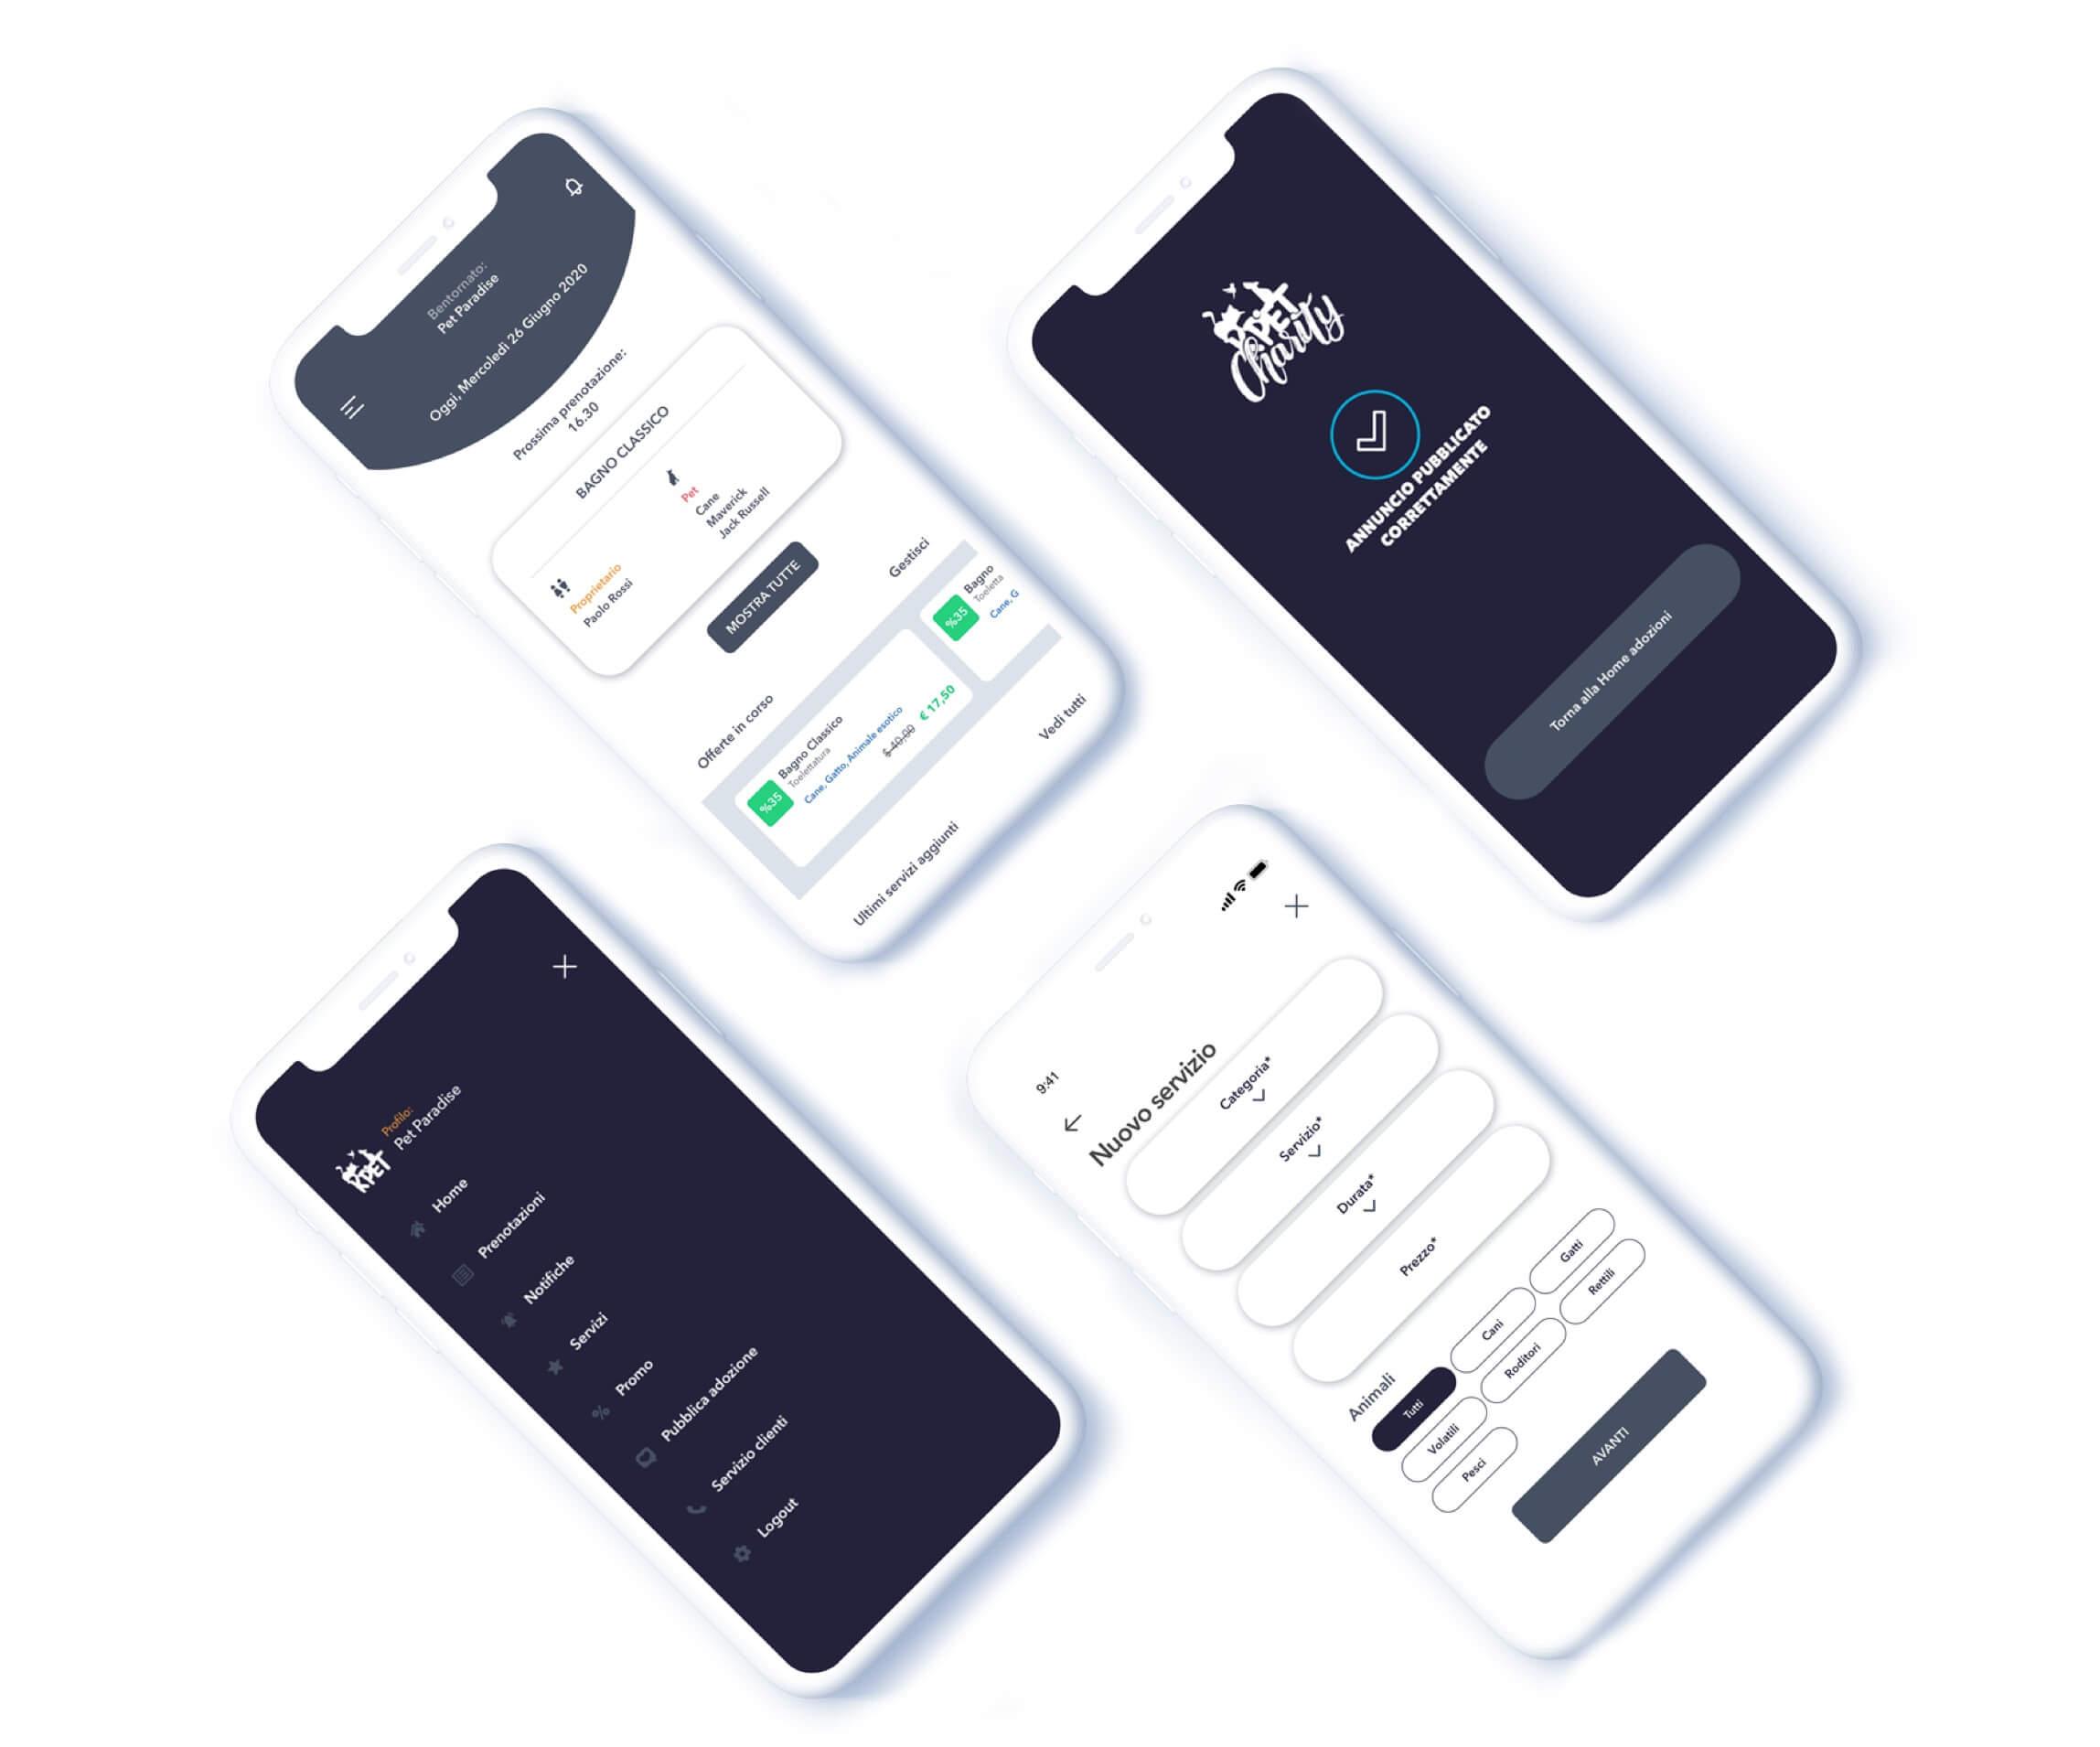 Kpet - app partner - Carpediem srl